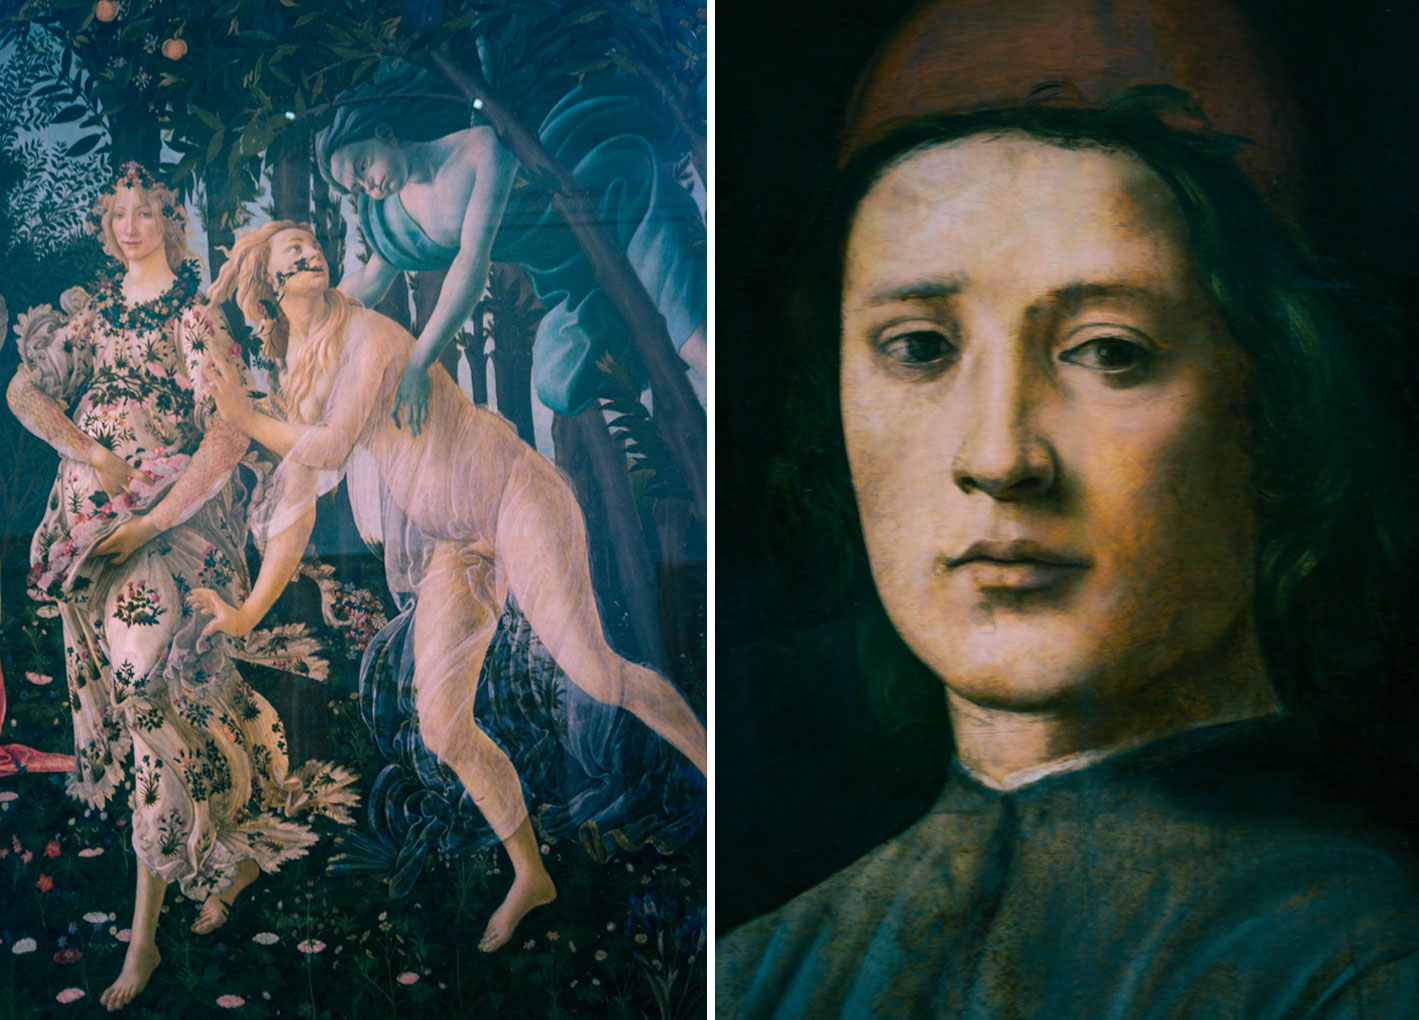 Att göra i Florens: besöka Uffizi